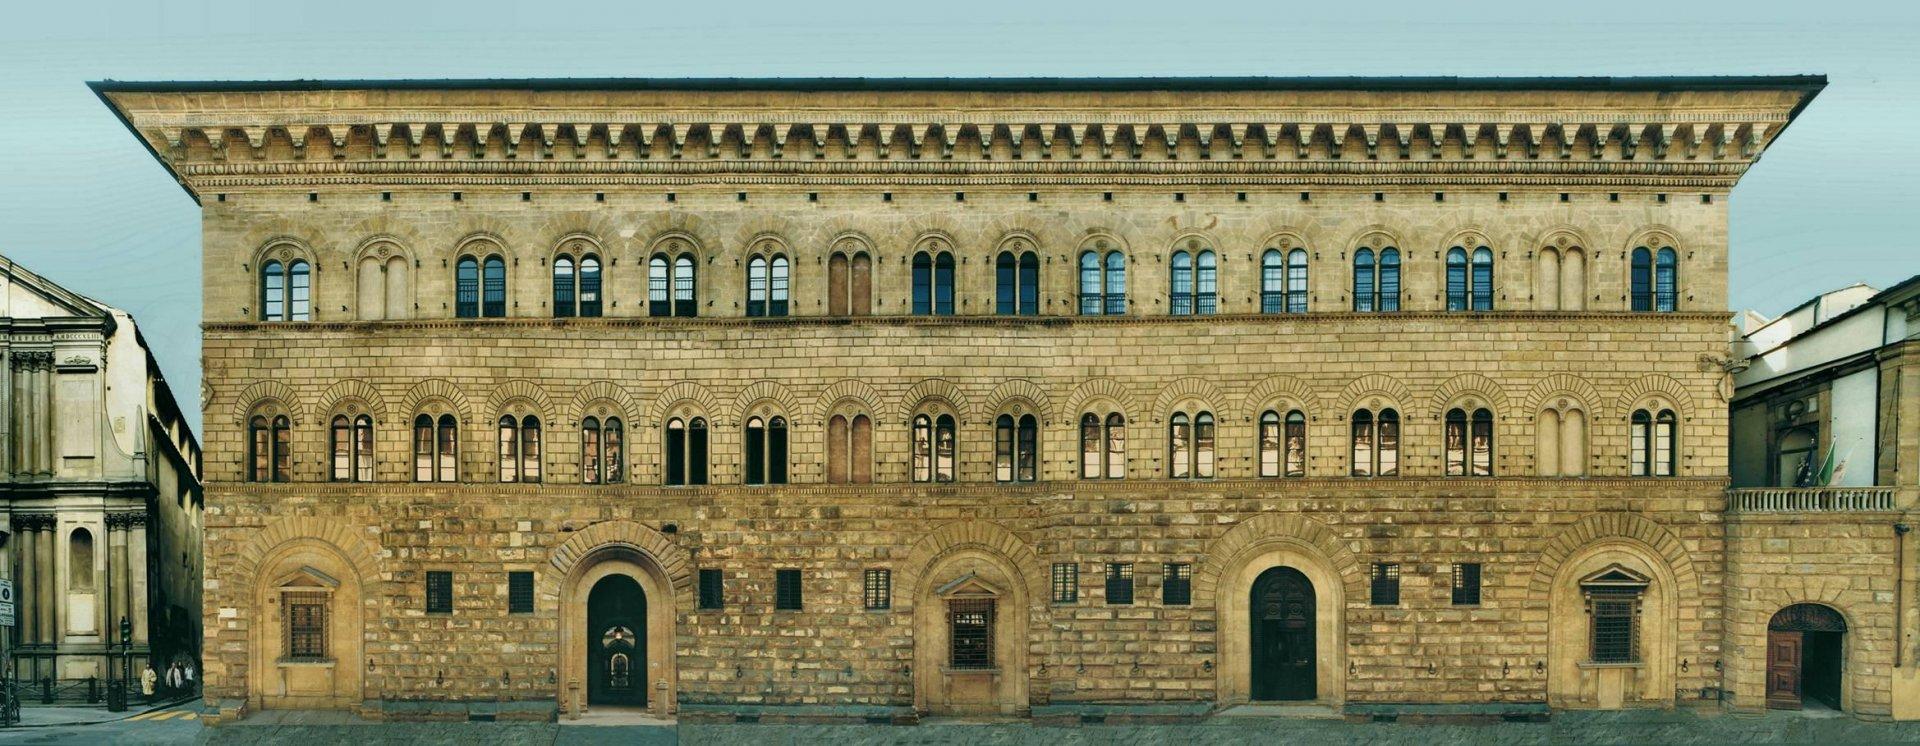 palazzo_medici_bartolomeo_florence_ren1335753715237.jpg